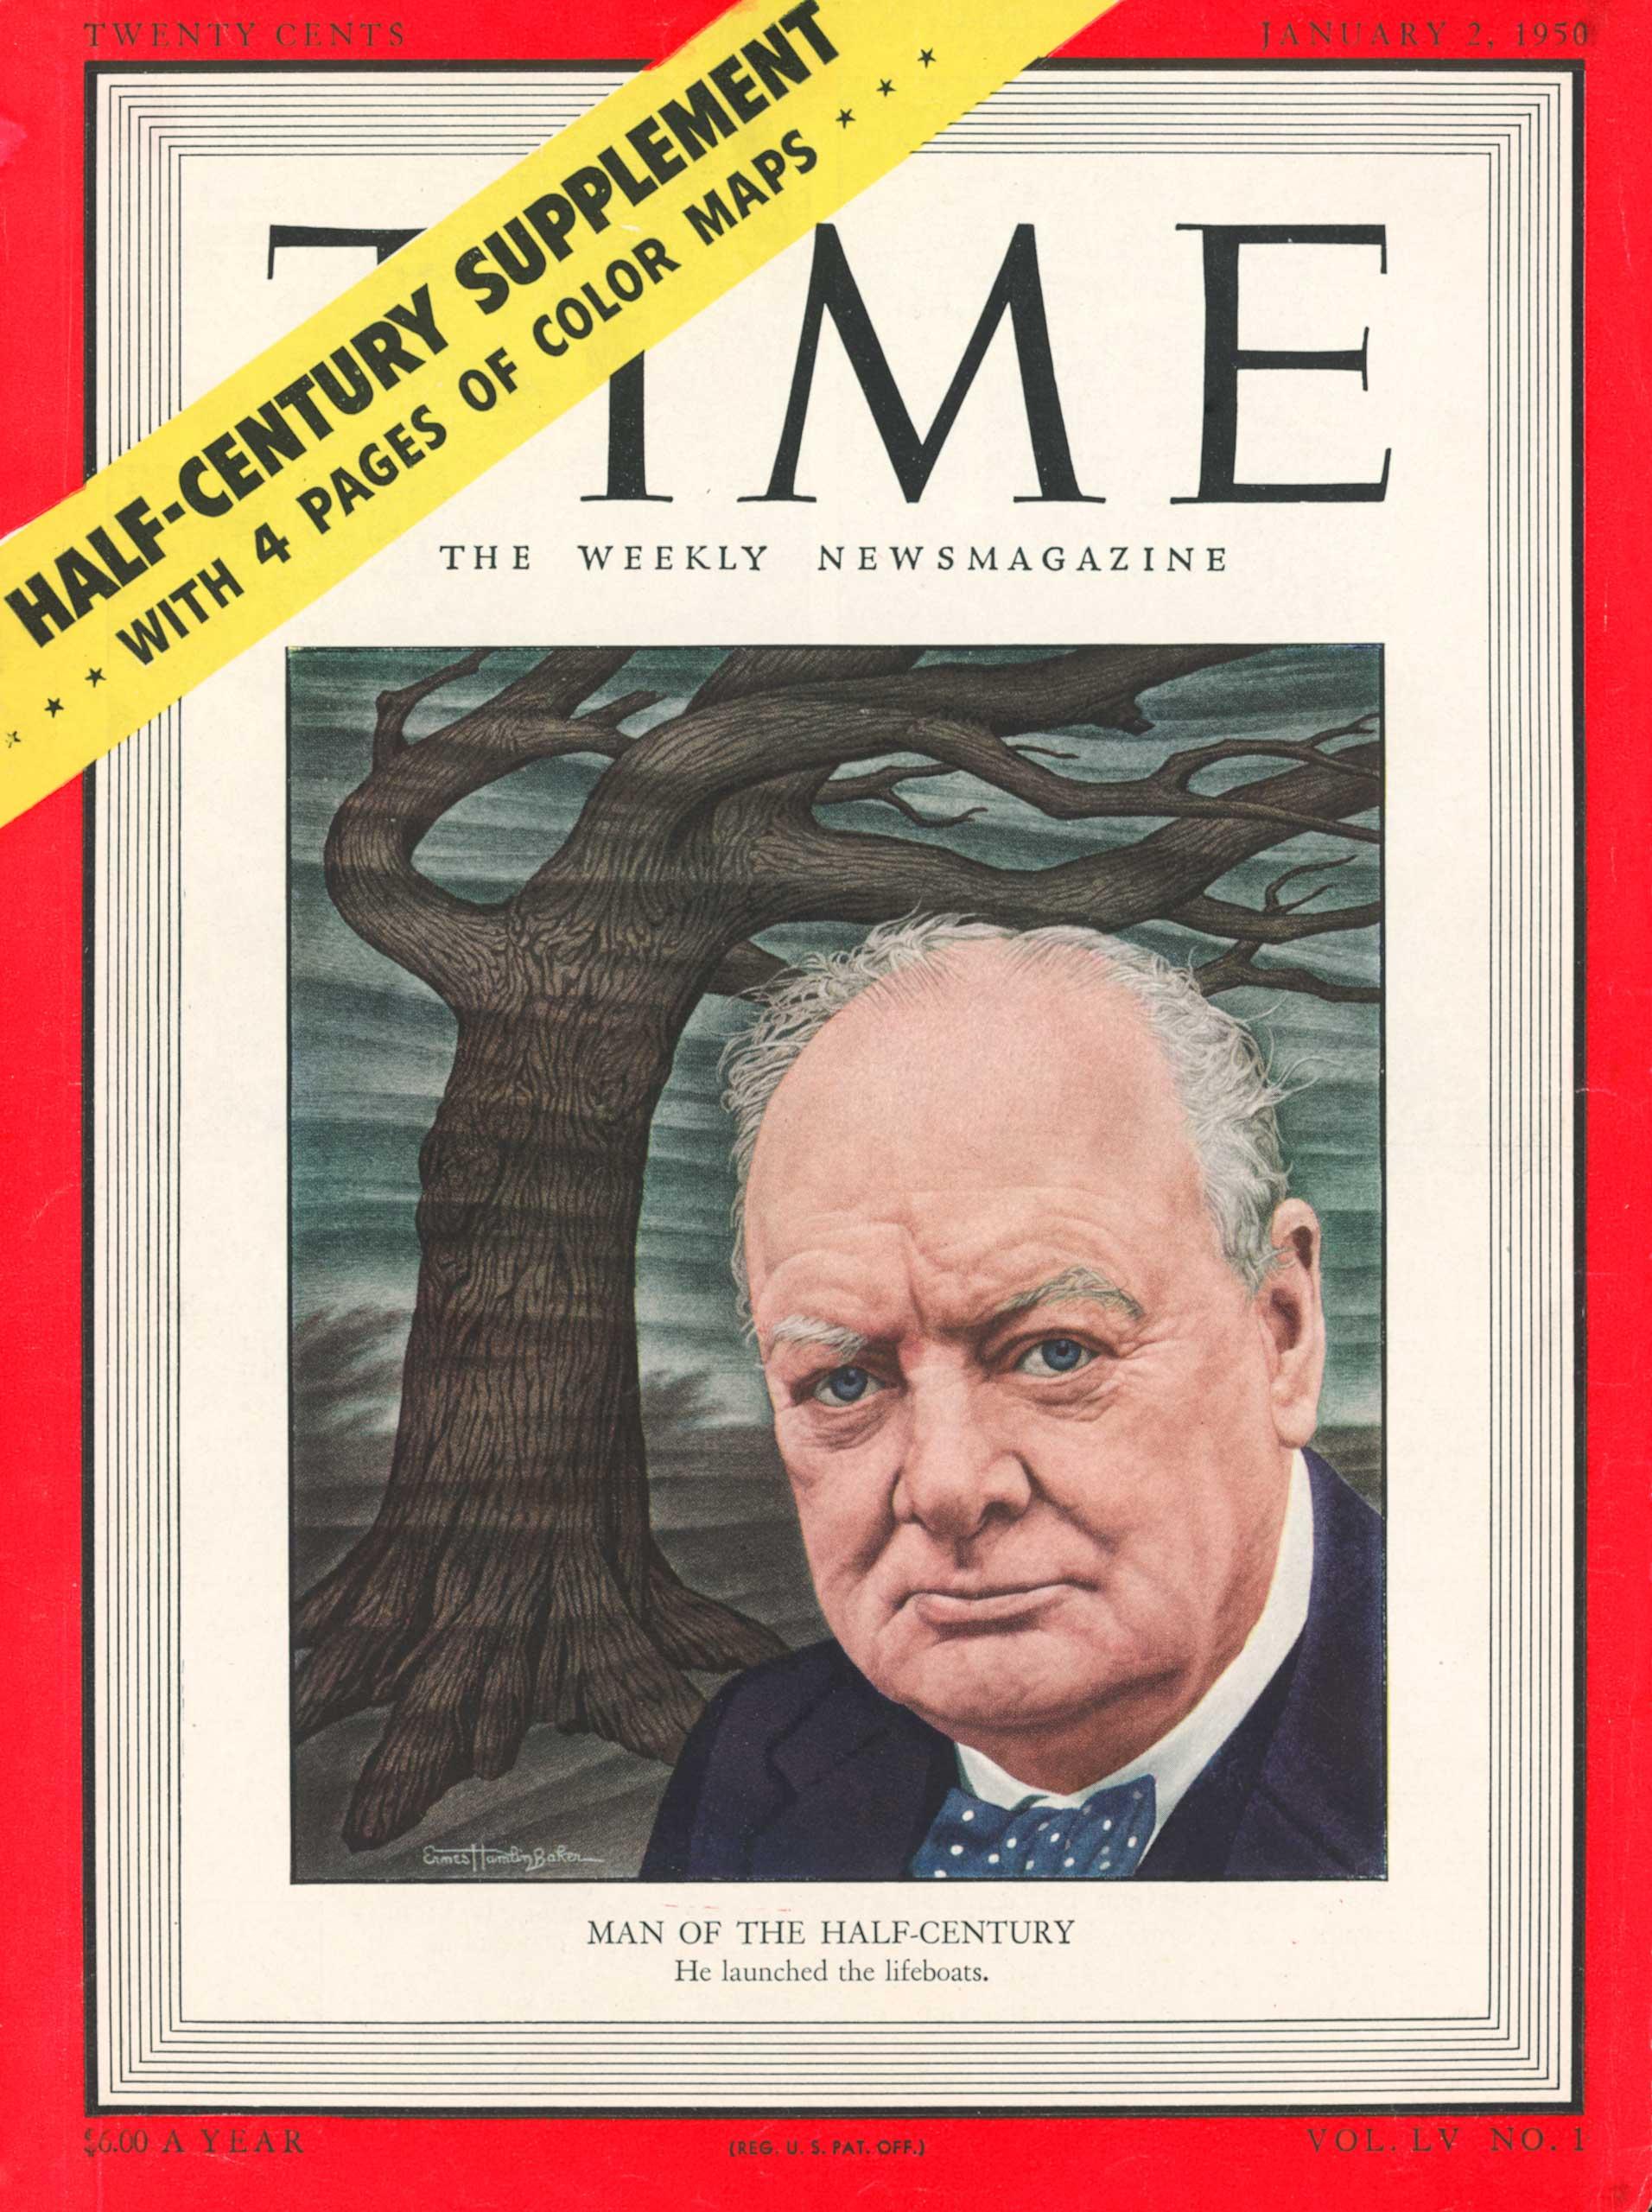 1949: Winston Churchill